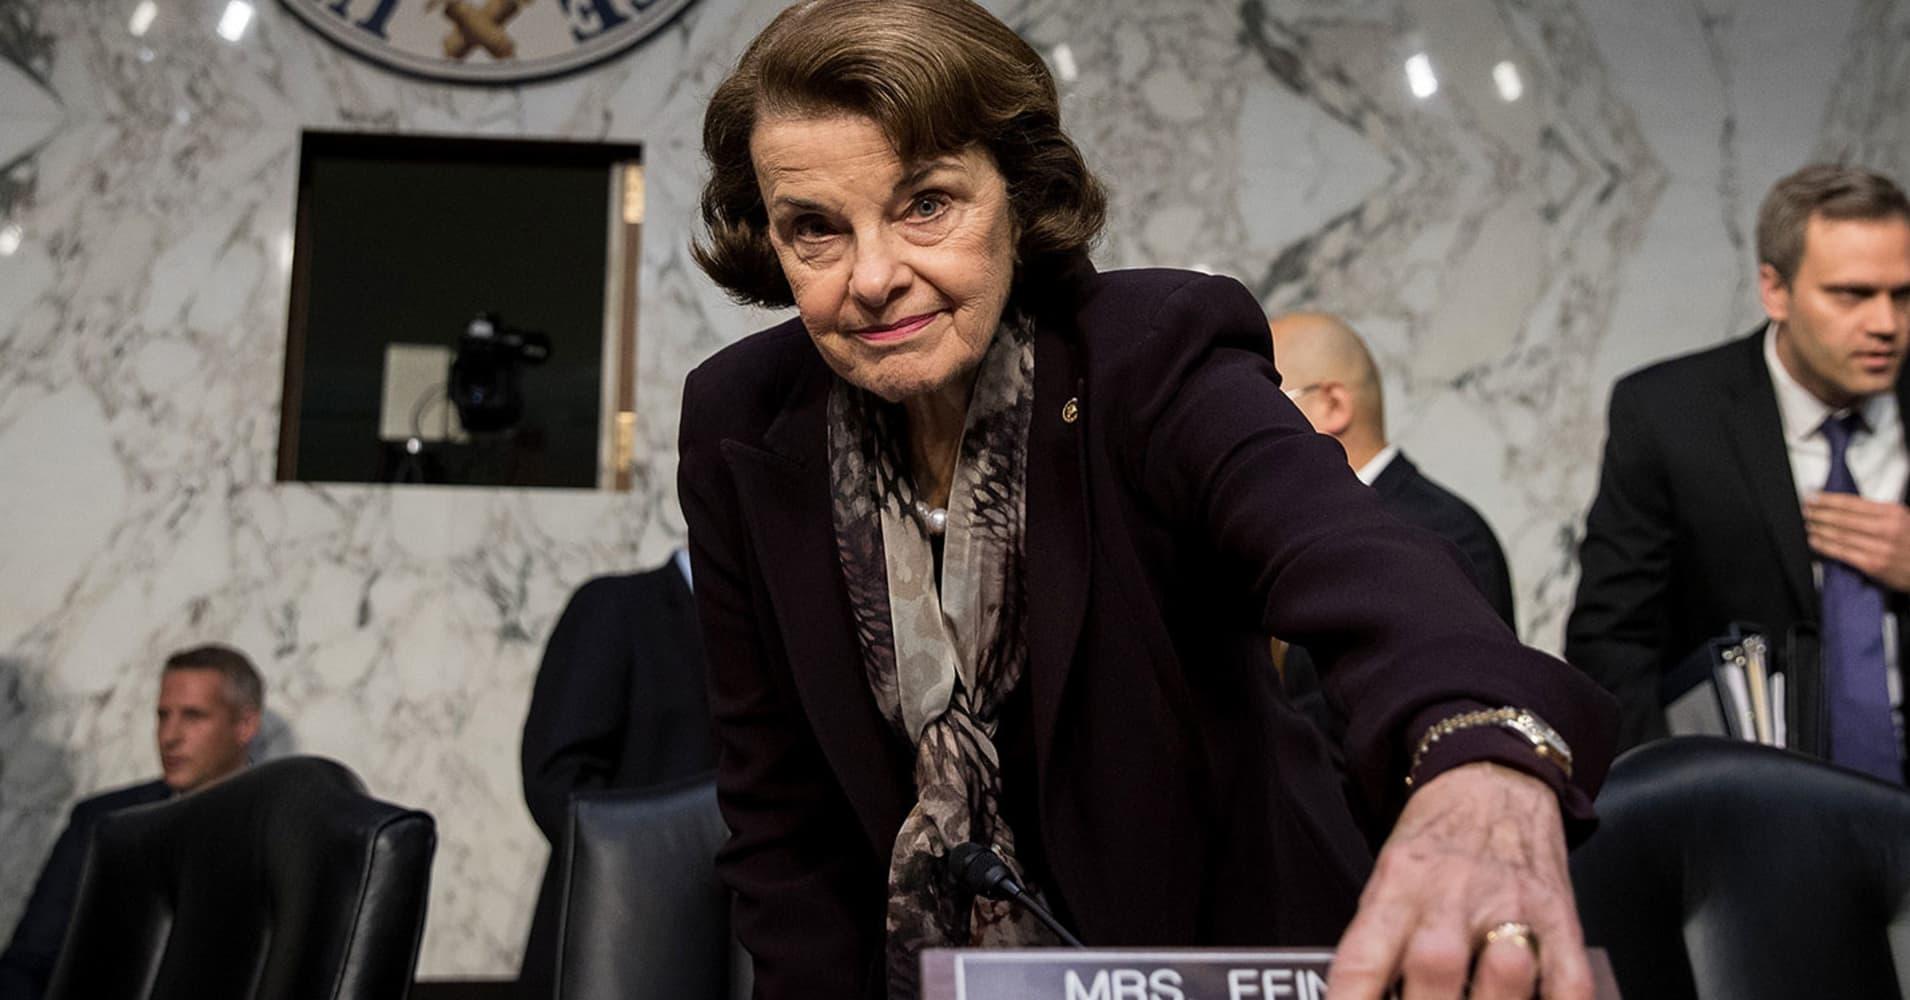 Sen. Dianne Feinstein unilaterally releases Fusion GPS testimony on Russian-Trump dossier